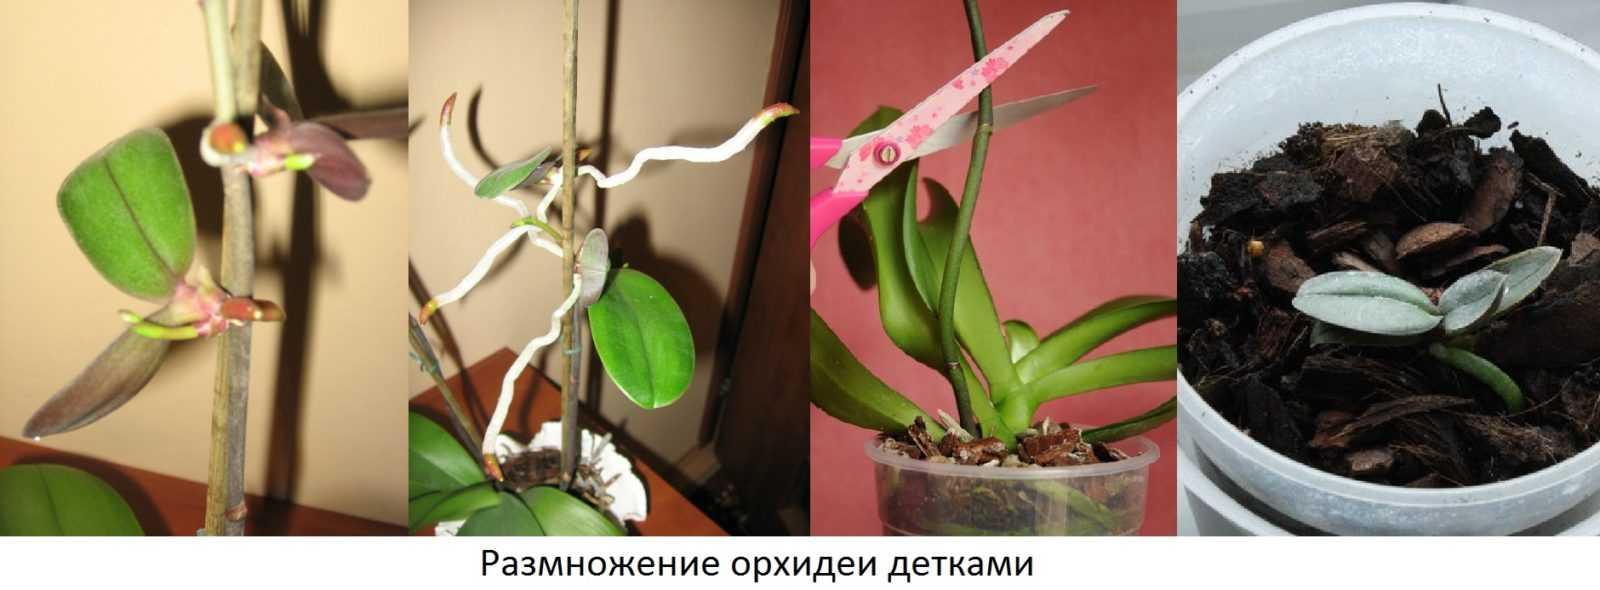 orhideya-falenopsis-foto-video-vidyi-falenopsis-harakteristika-i-opisanie-9